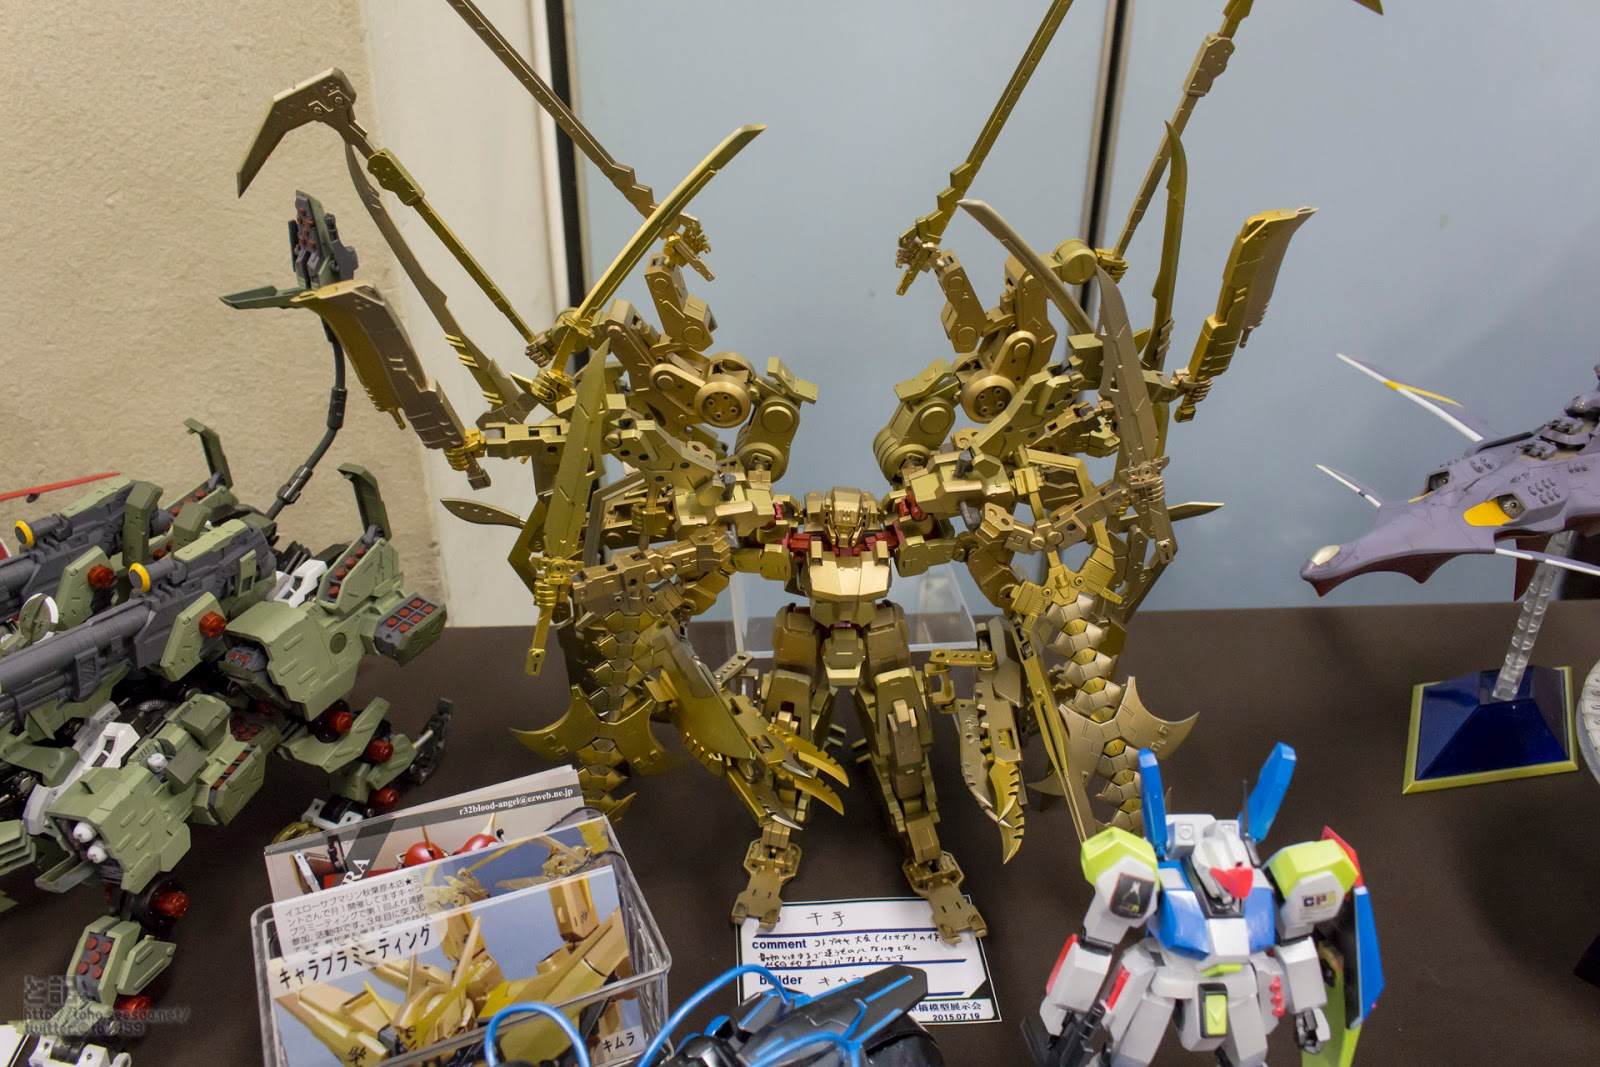 D Printing Exhibition Tokyo : Gundam guy cpm asakusabashi plastic model exhibition